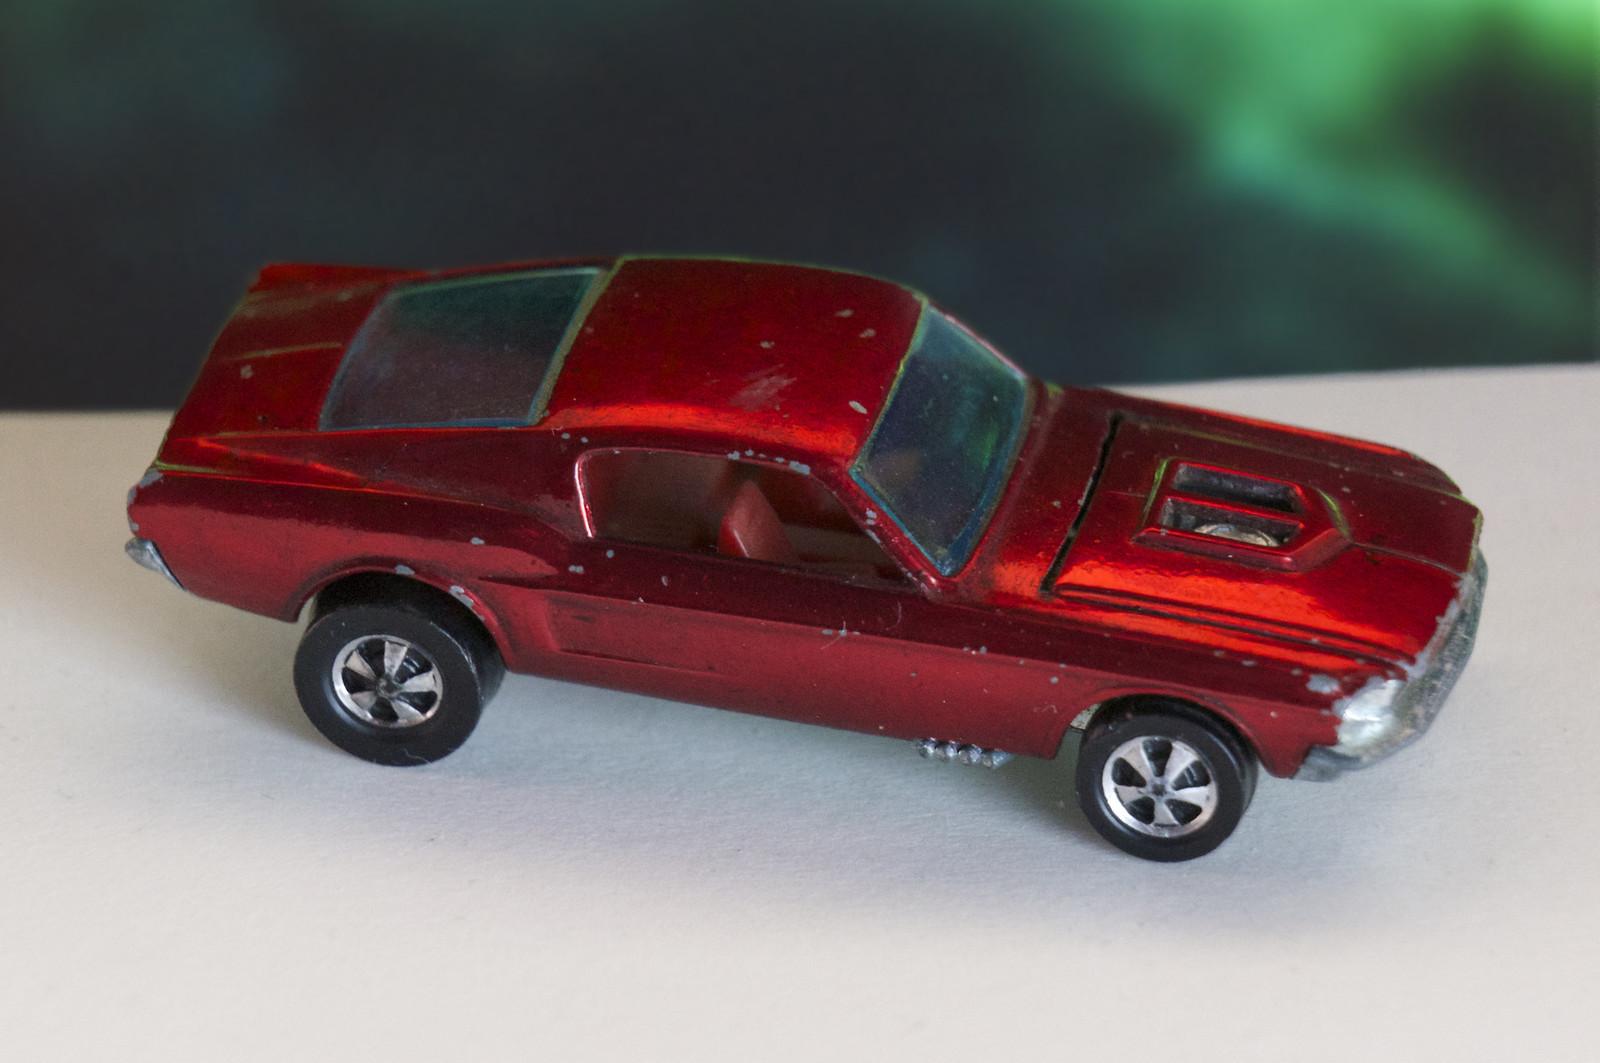 Hot Wheels Redline Early Production Red Custom Mustang Open Hood Scoop HK